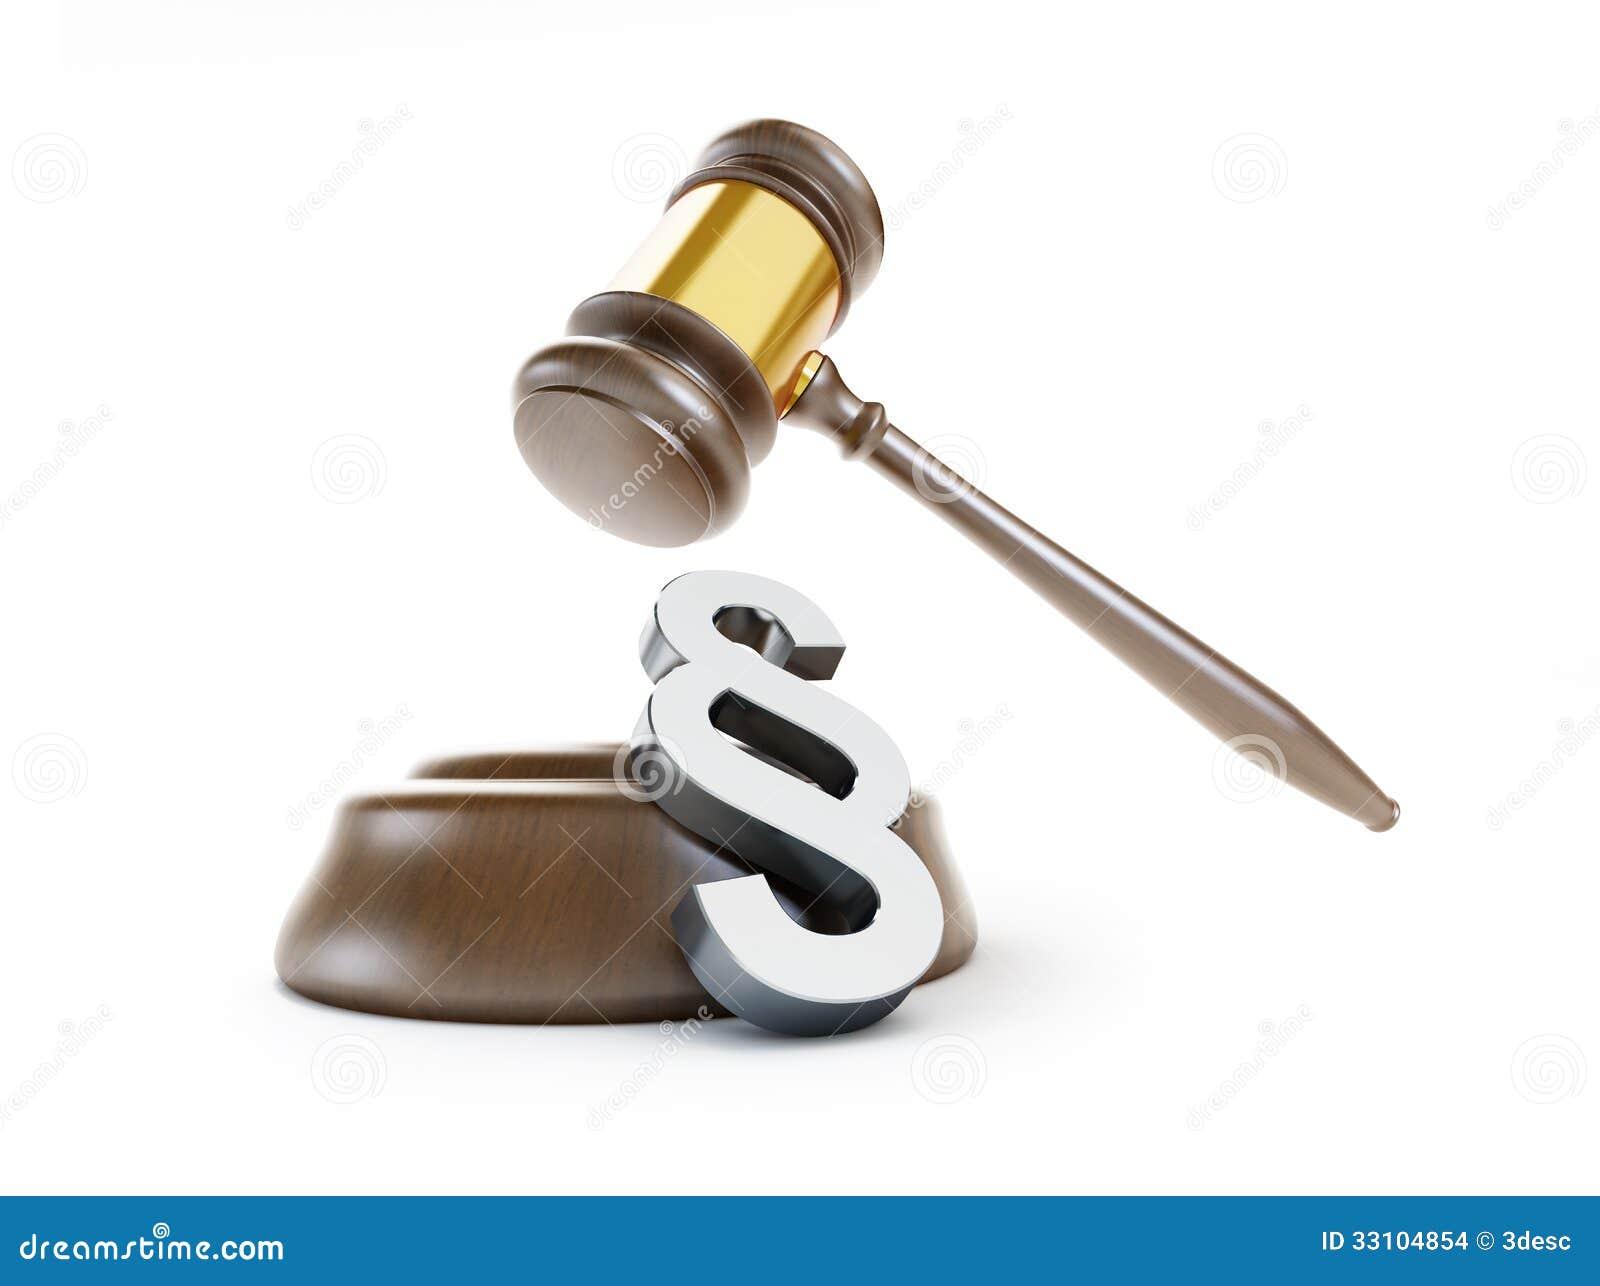 paragraph-symbol-law-white-background-33104854.jpg